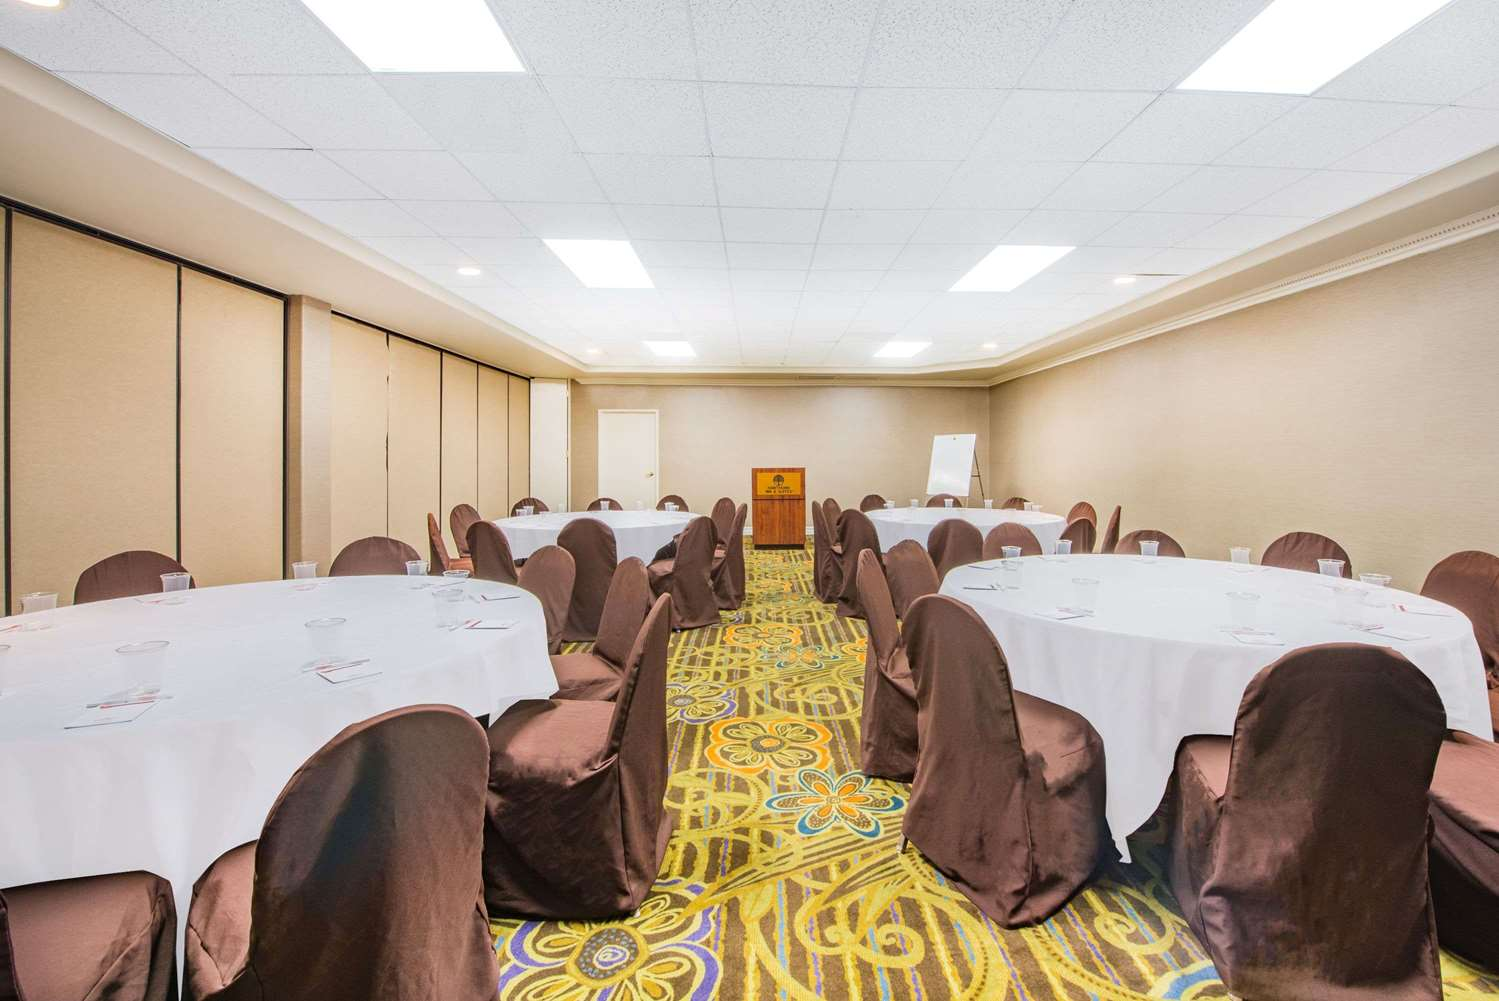 Ballroom - Hawthorn Suites by Wyndham Airport El Paso